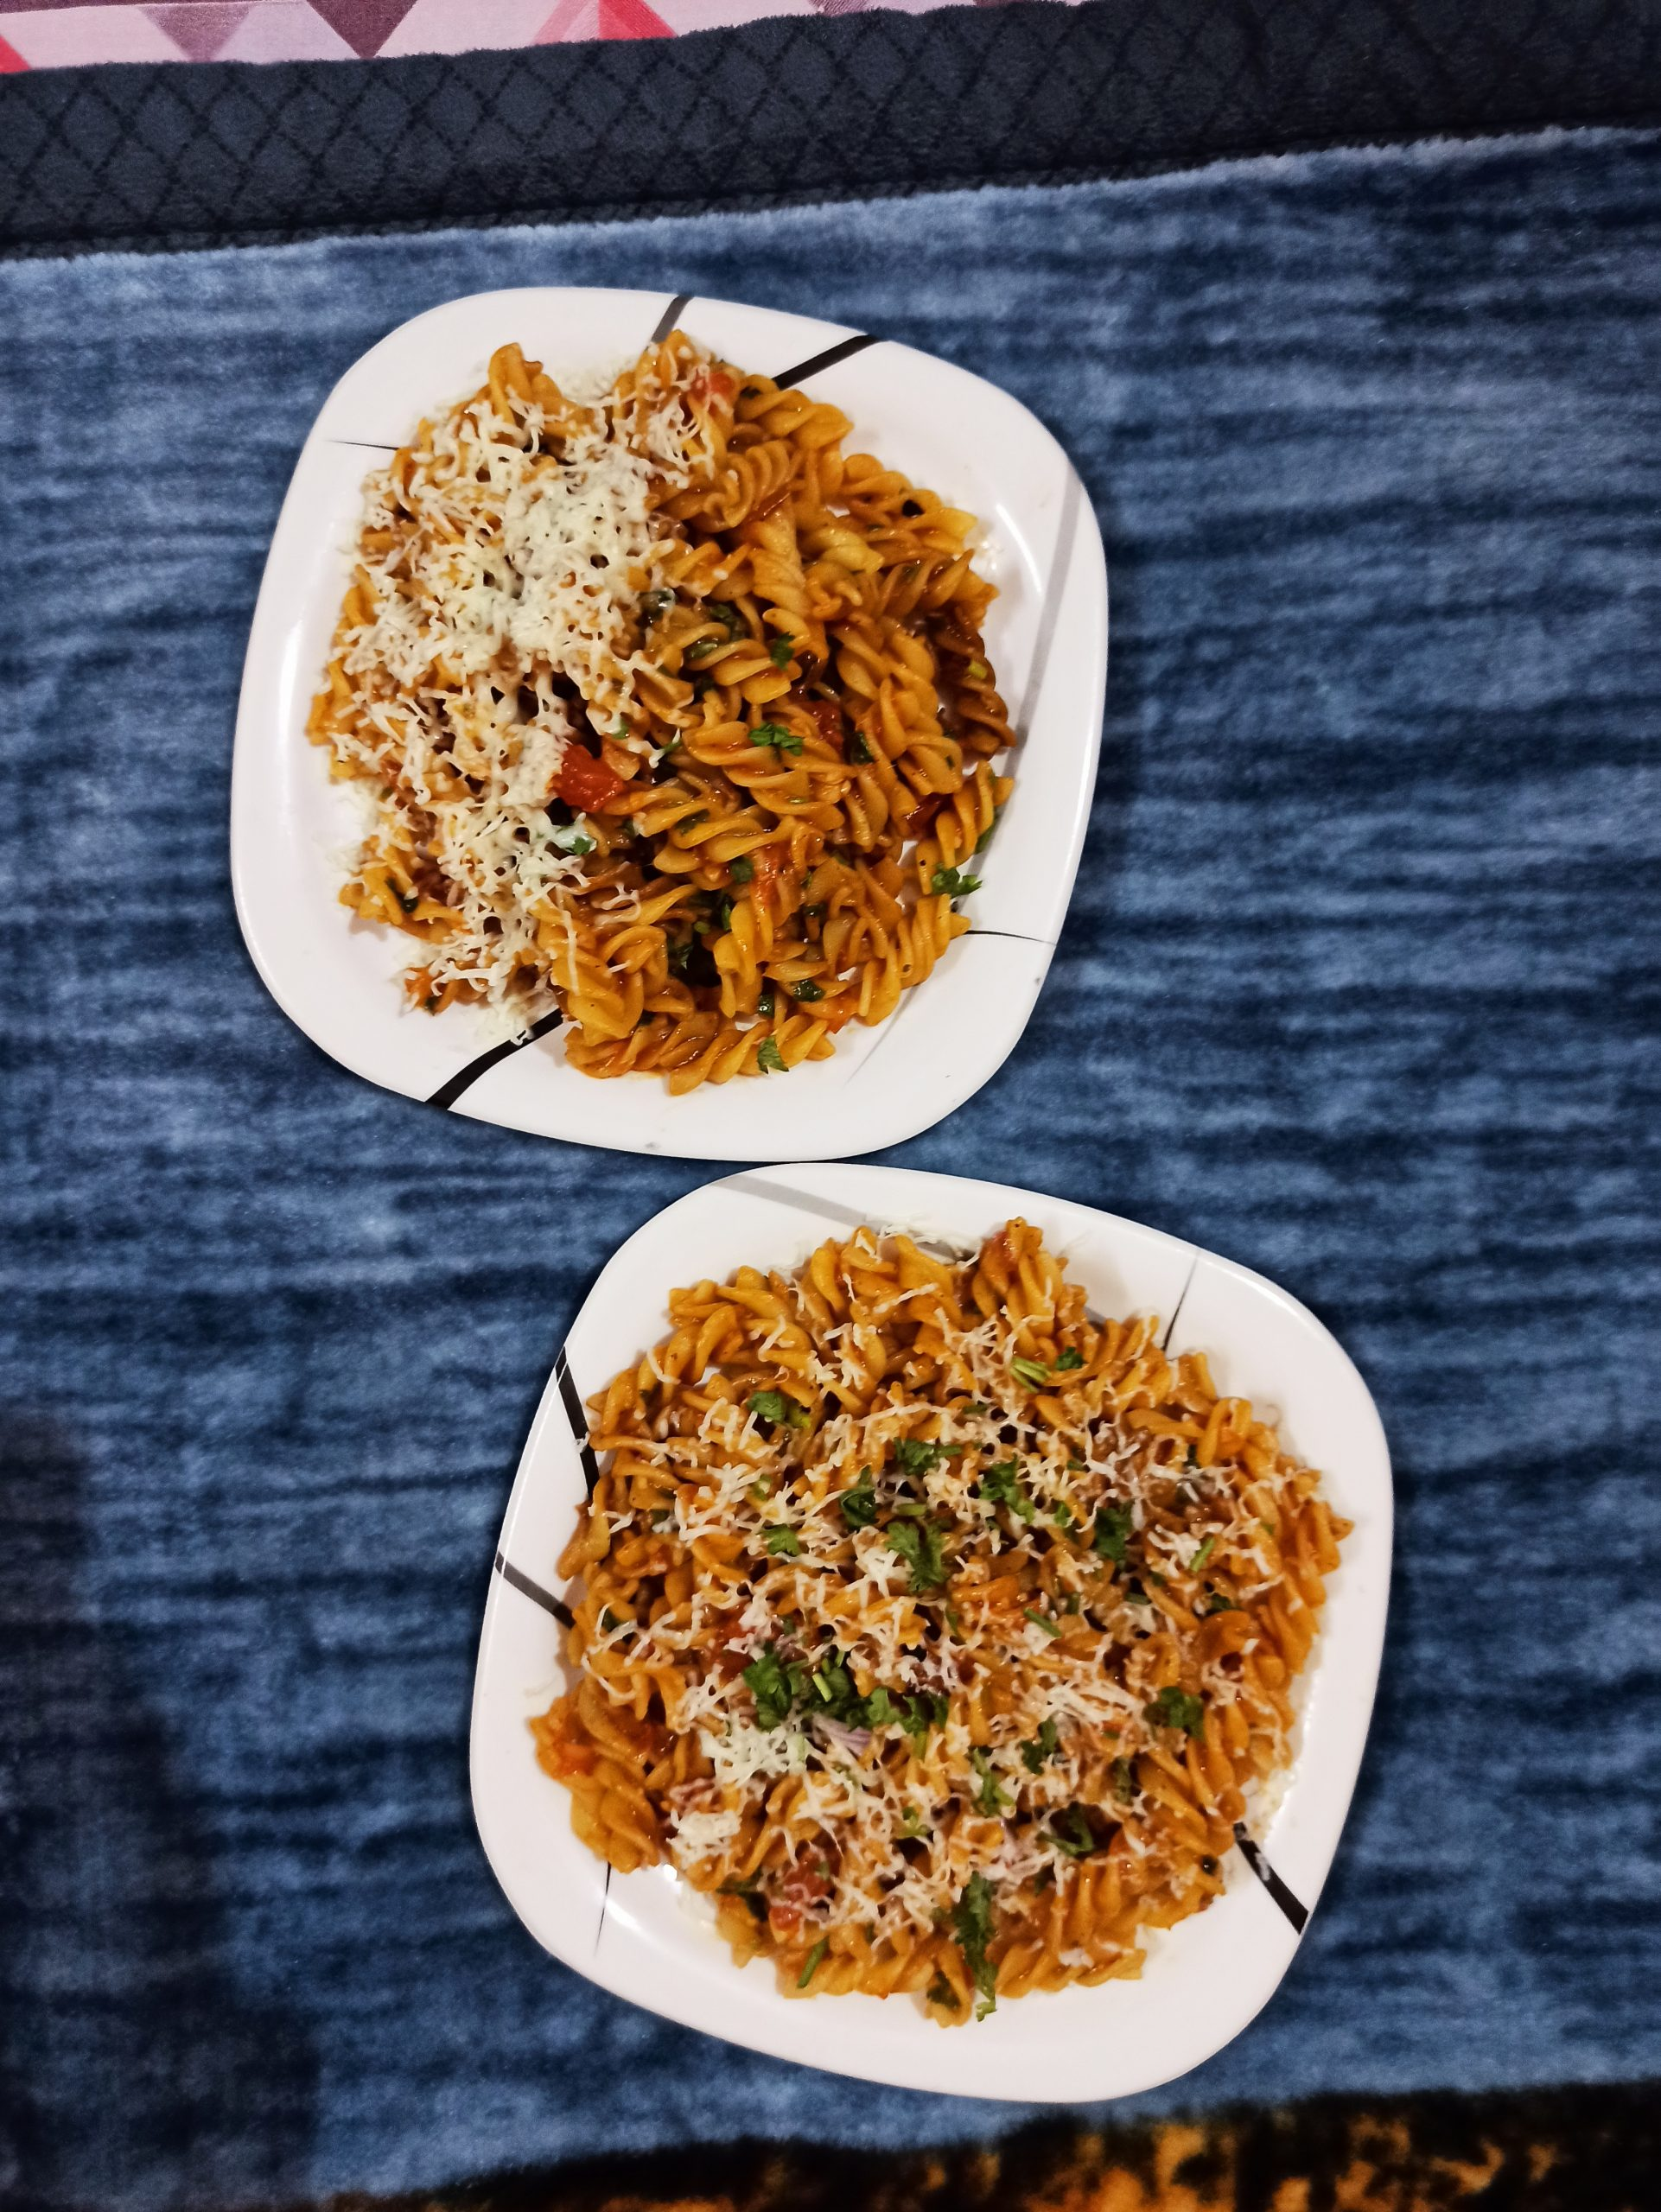 Fusilli pasta in plates